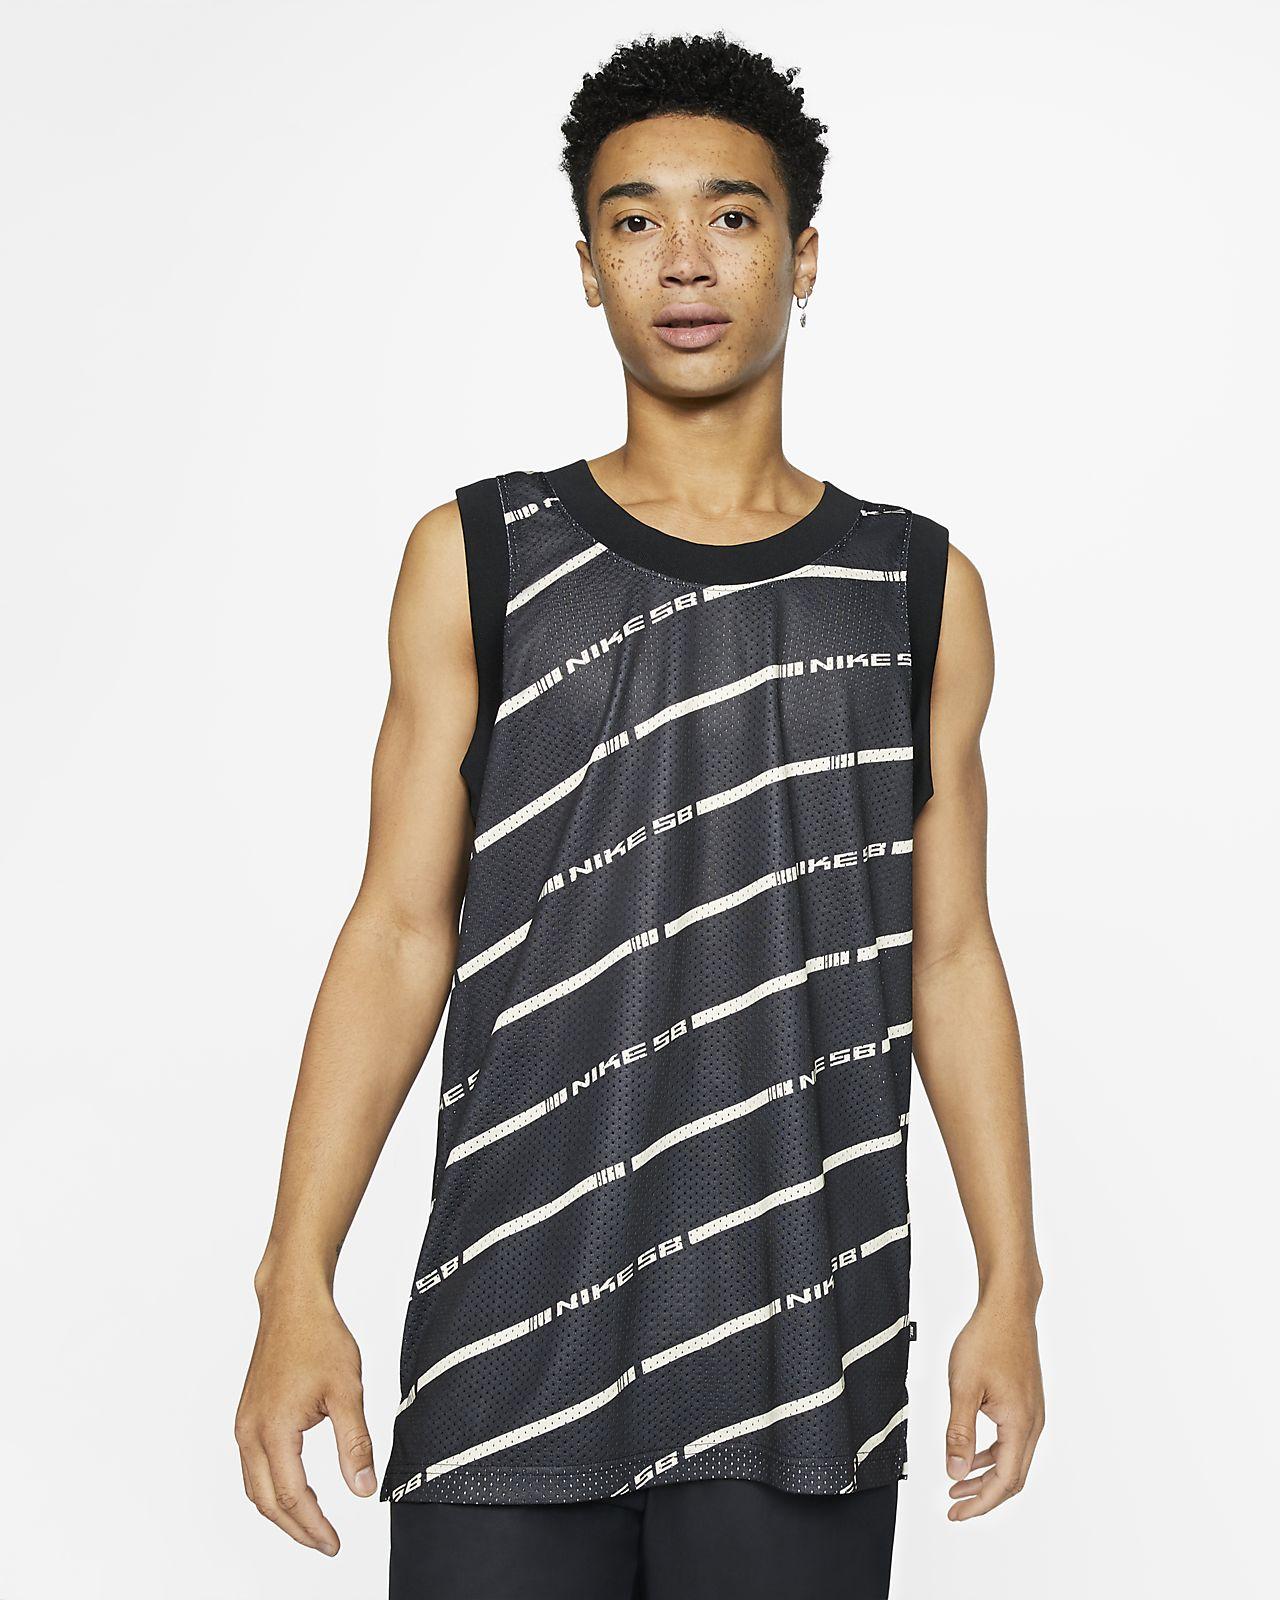 Nike SB Men's Skate Tank